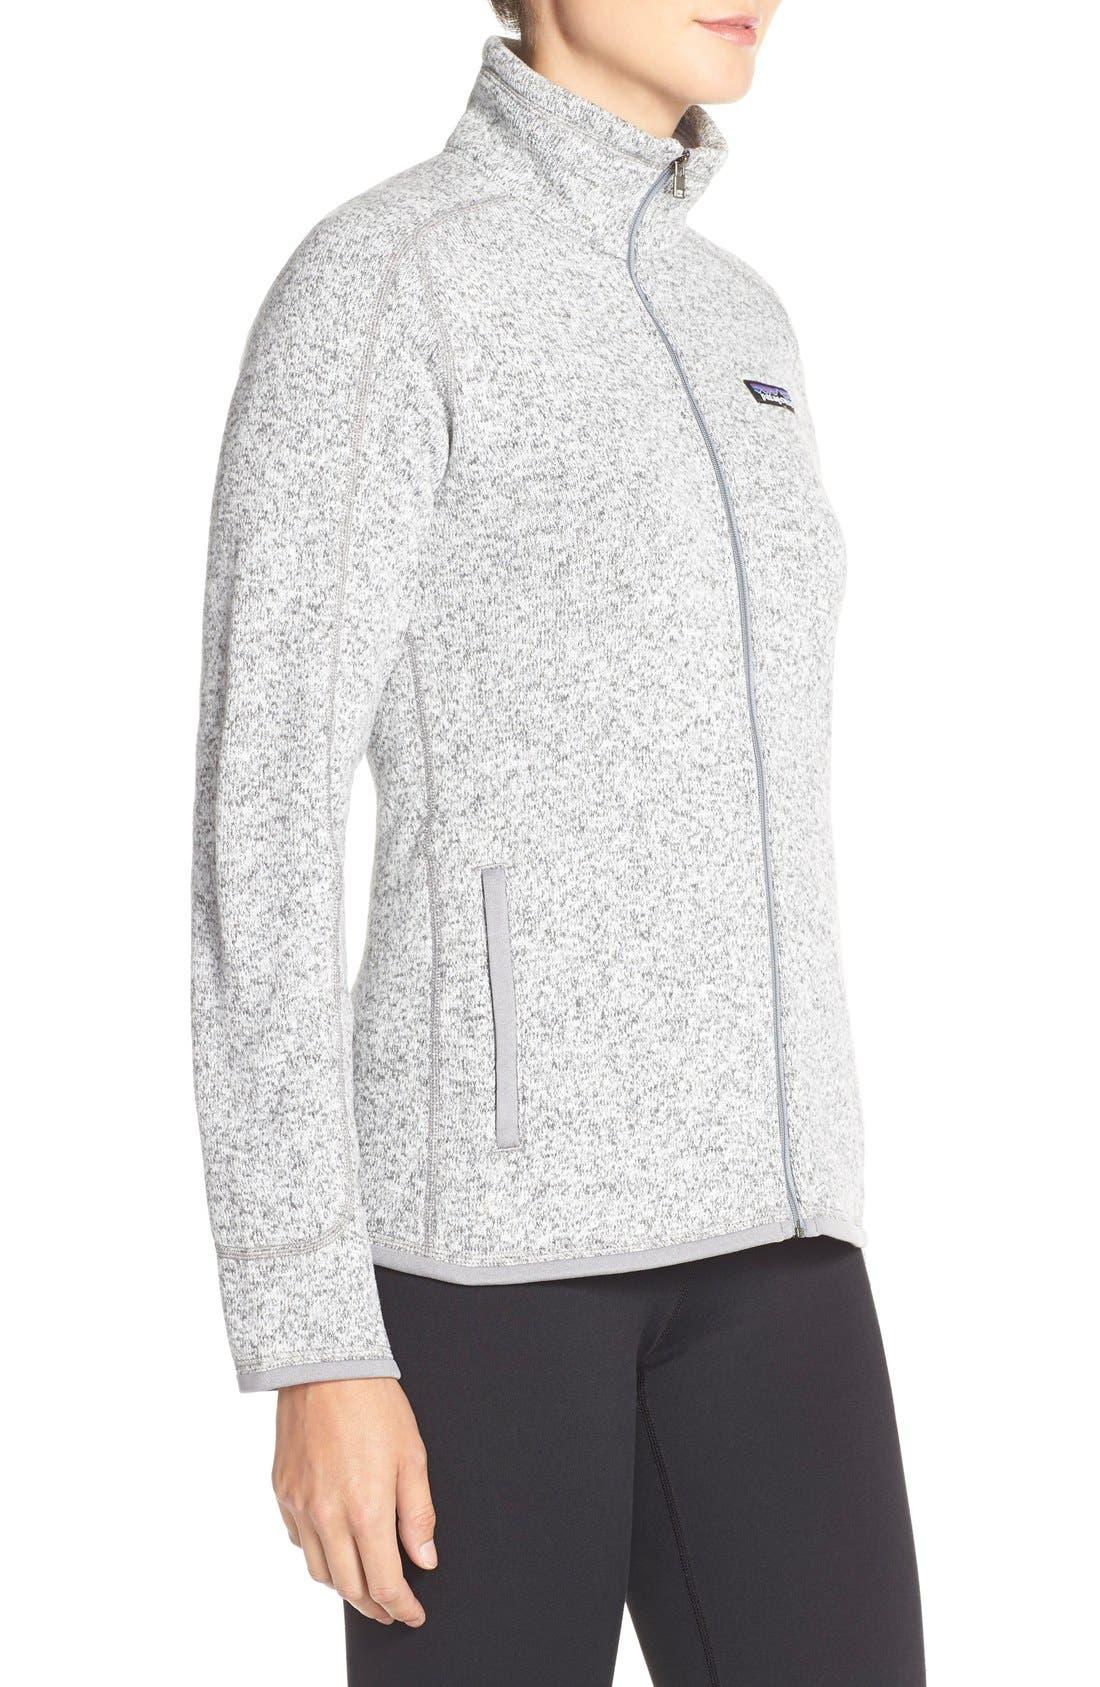 'BetterSweater' Jacket,                             Alternate thumbnail 6, color,                             BIRCH WHITE